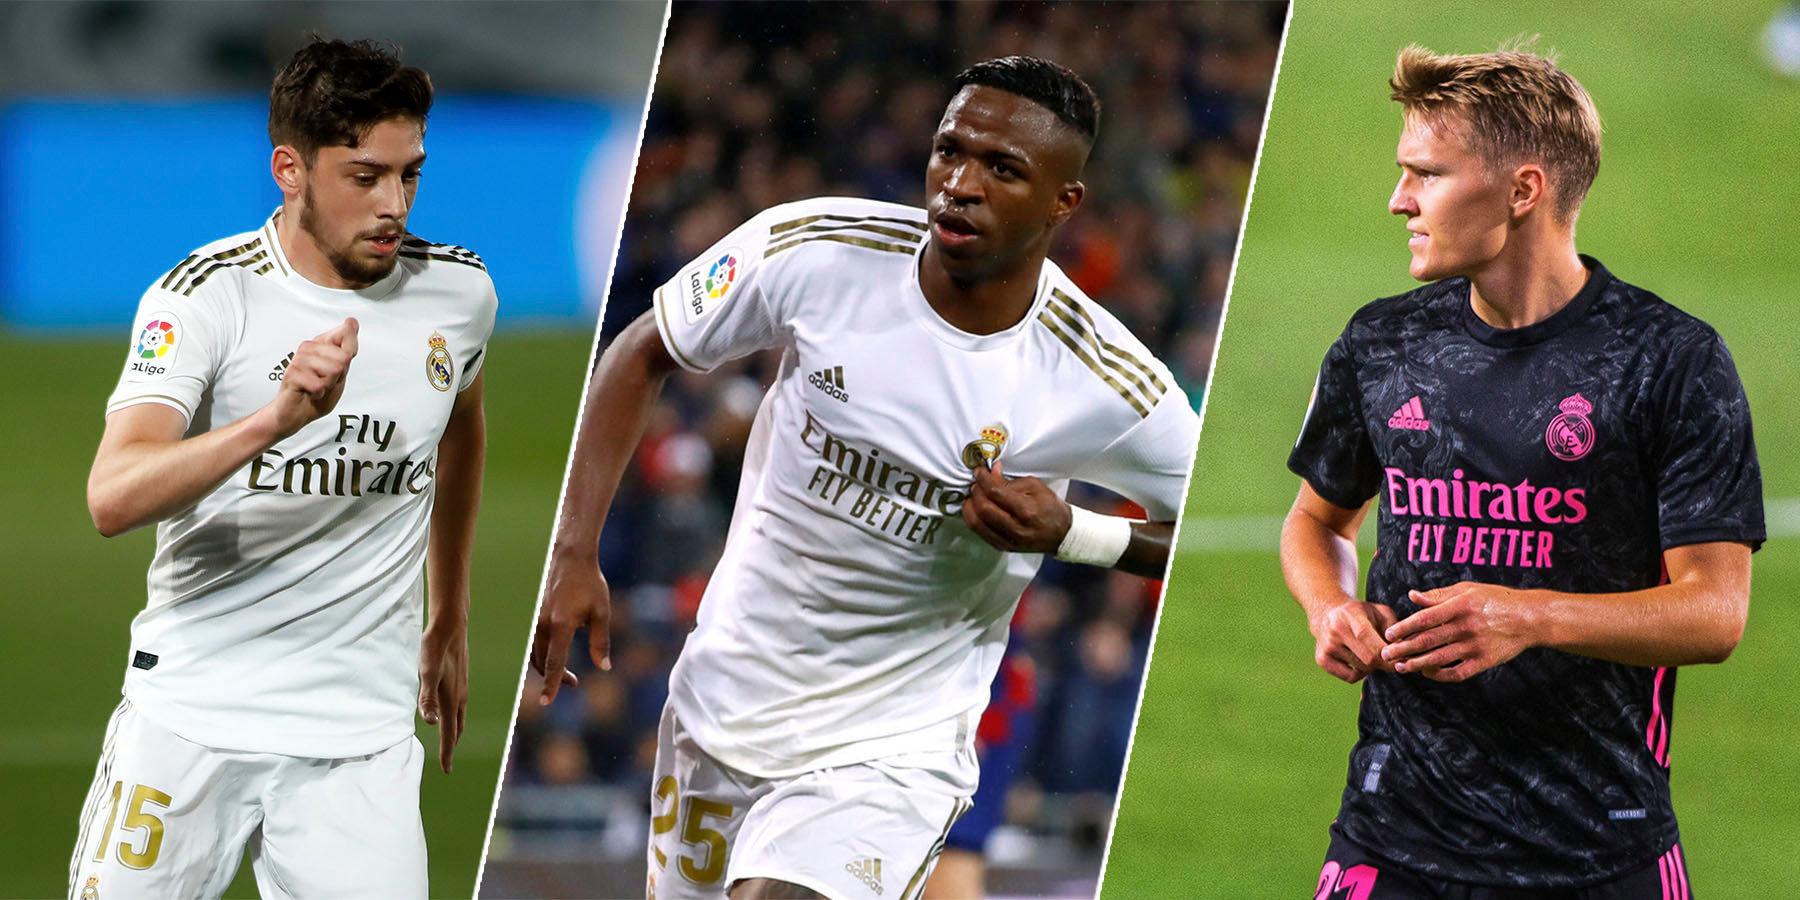 Полна коробушка! Куда «Реал» пристроит талантливую молодёжь?